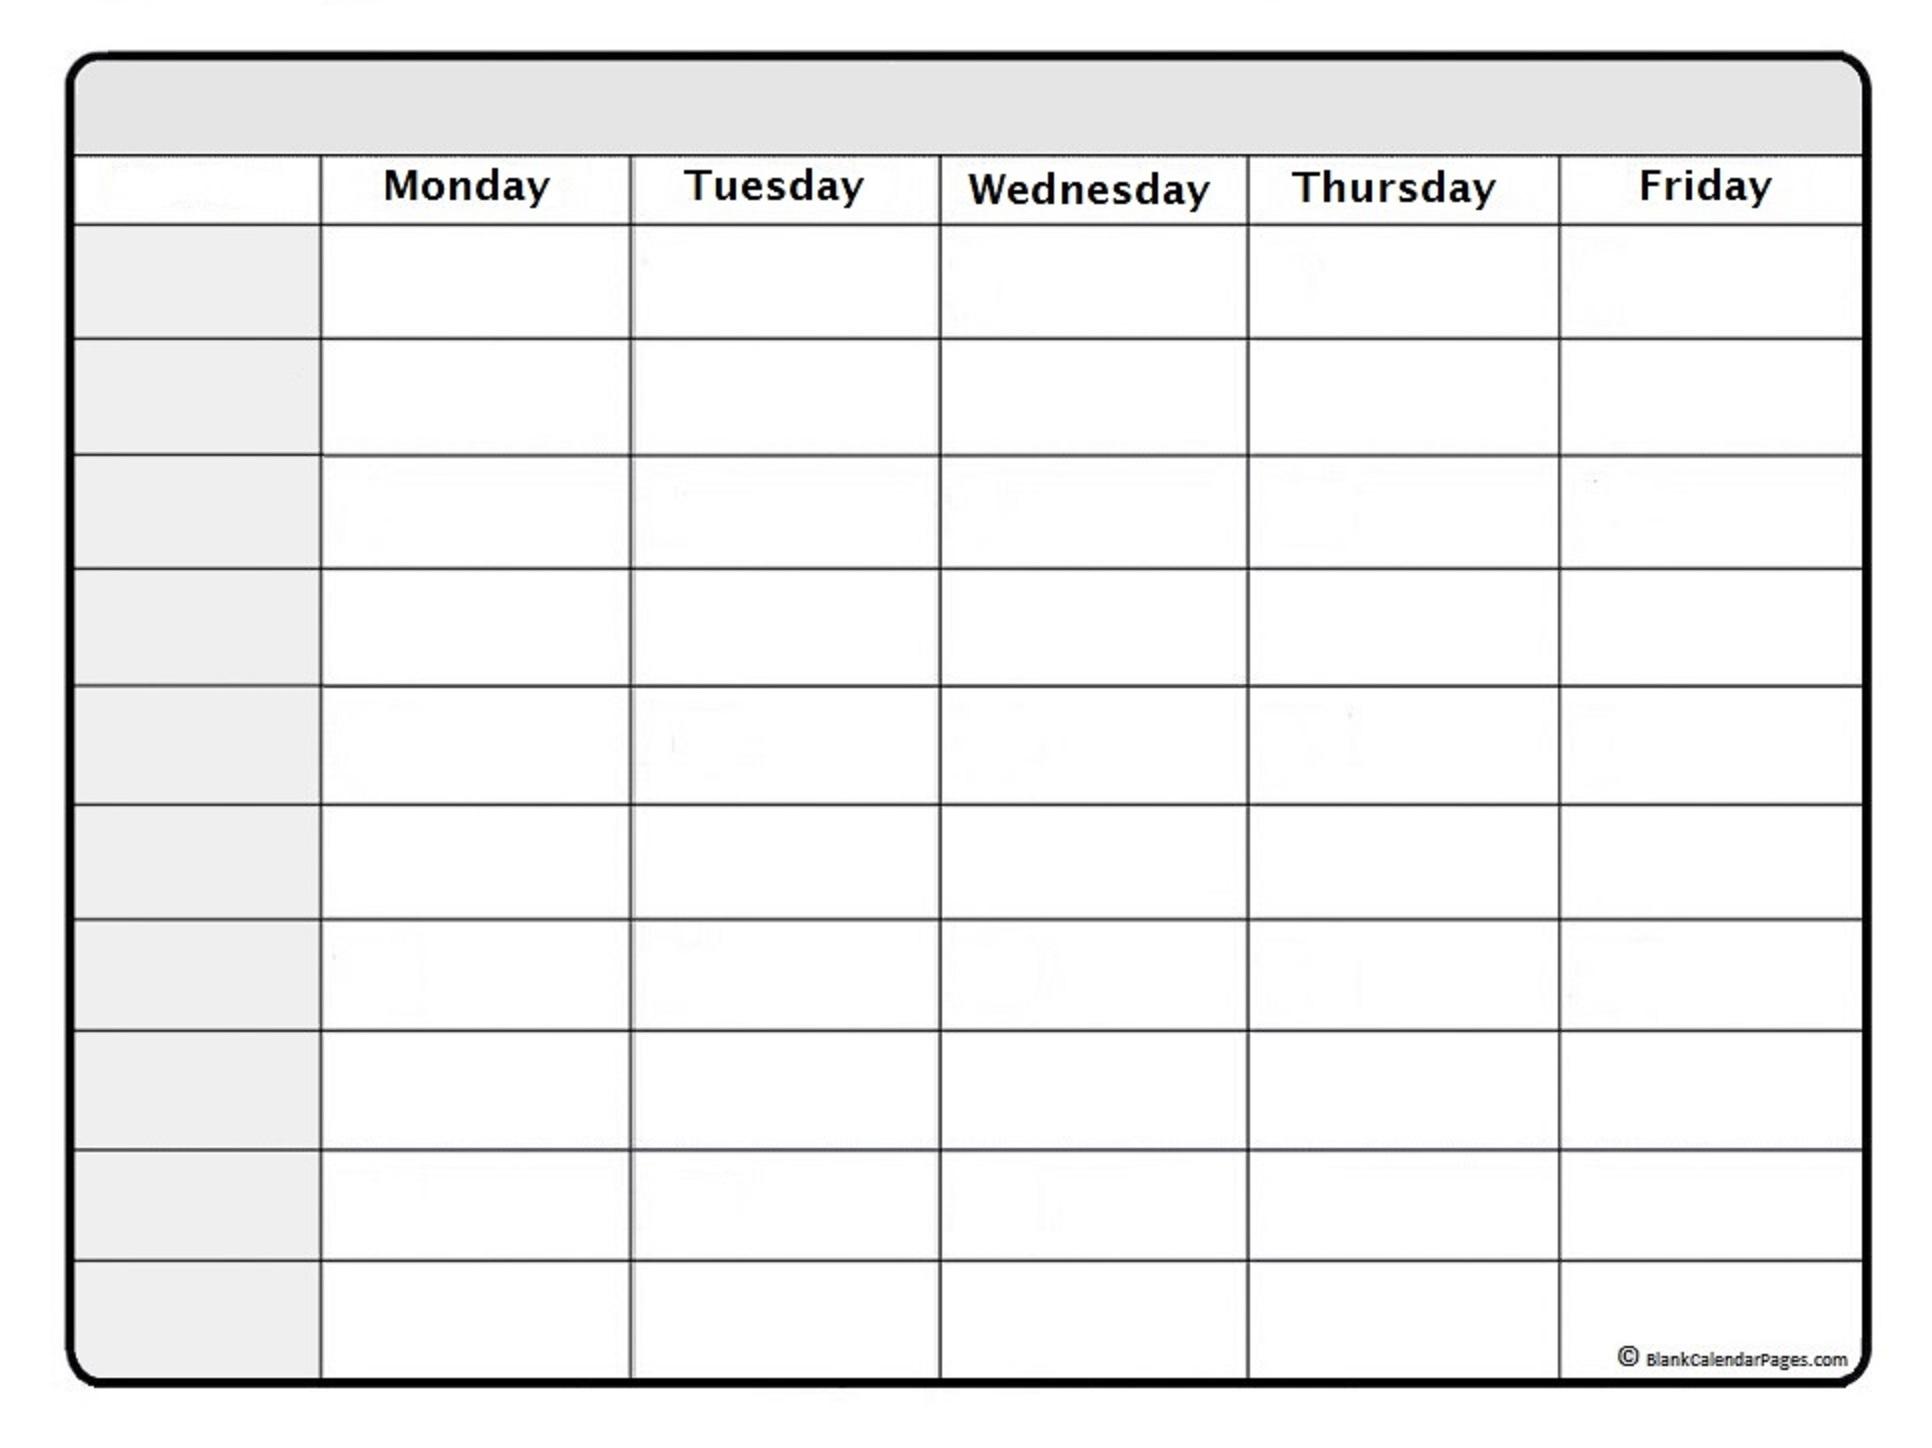 May 2019 Weekly Calendar | May 2019 Weekly Calendar Template with Blank Weekly Schedule Template Printable